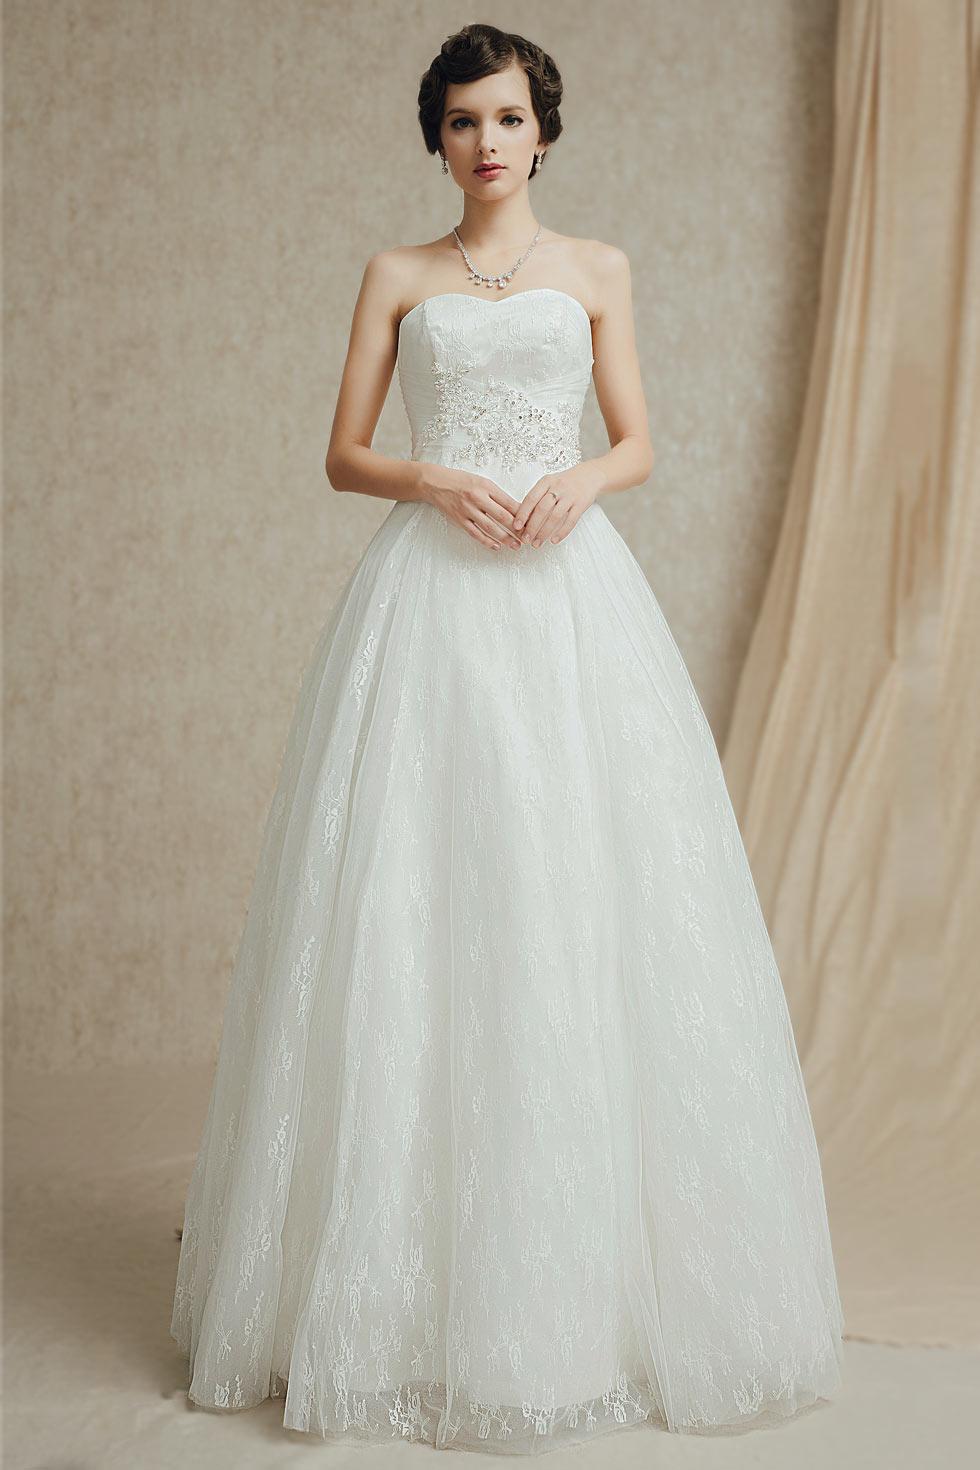 top wedding dresses websites wedding dresses websites Wedding Dresses Websites Affordable Uk 27